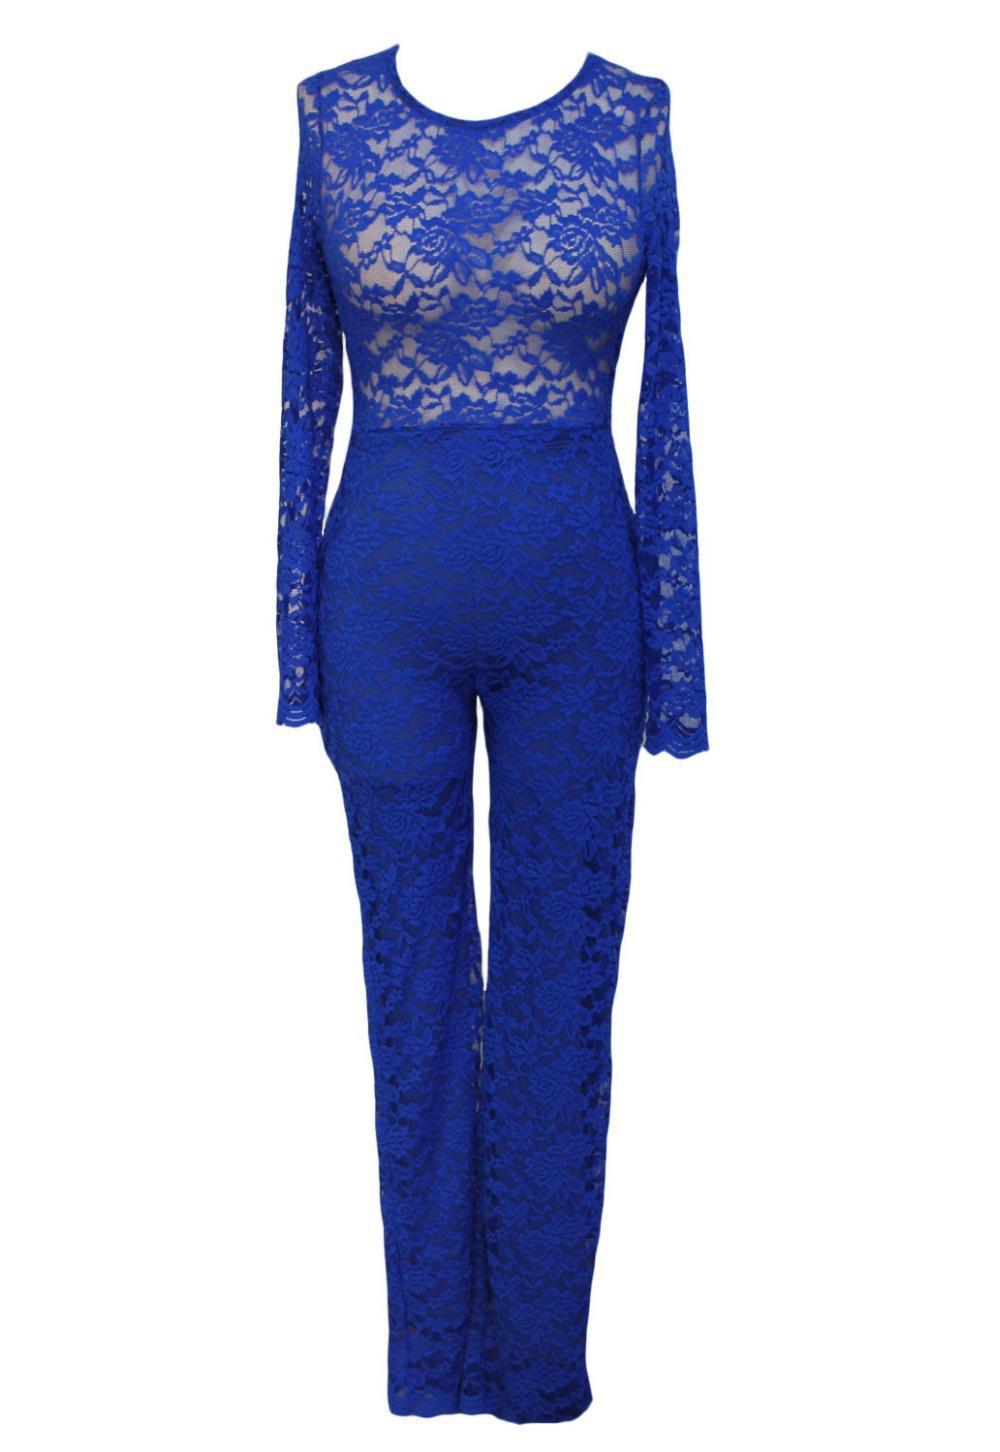 Aliexpress.com : Buy 2015 Fashion New Long Sleeve Jumpsuit Women ...